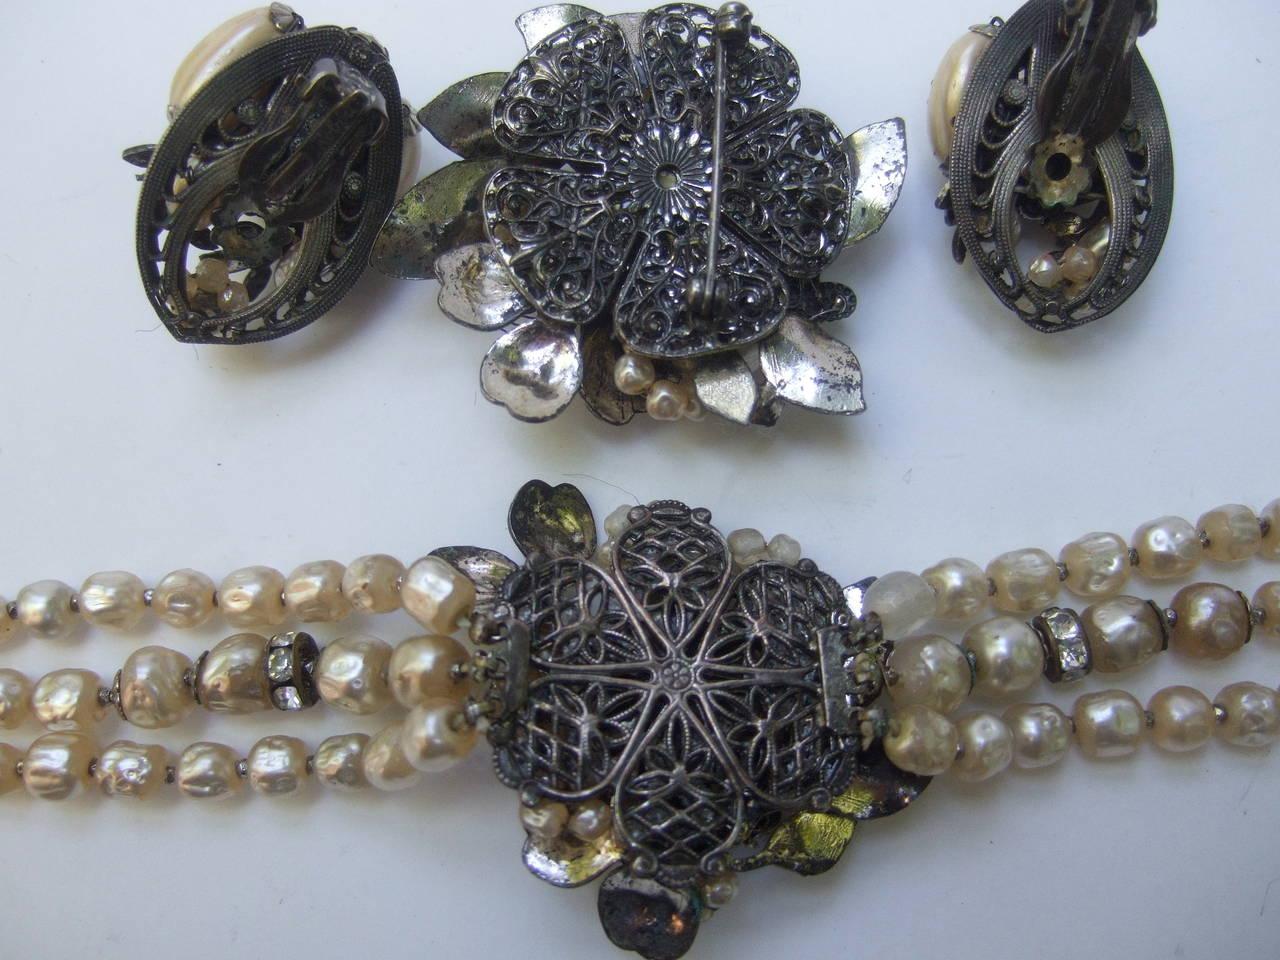 1950s Costume Pearl Brooch, Bracelet & Earrings by Robert For Sale 4